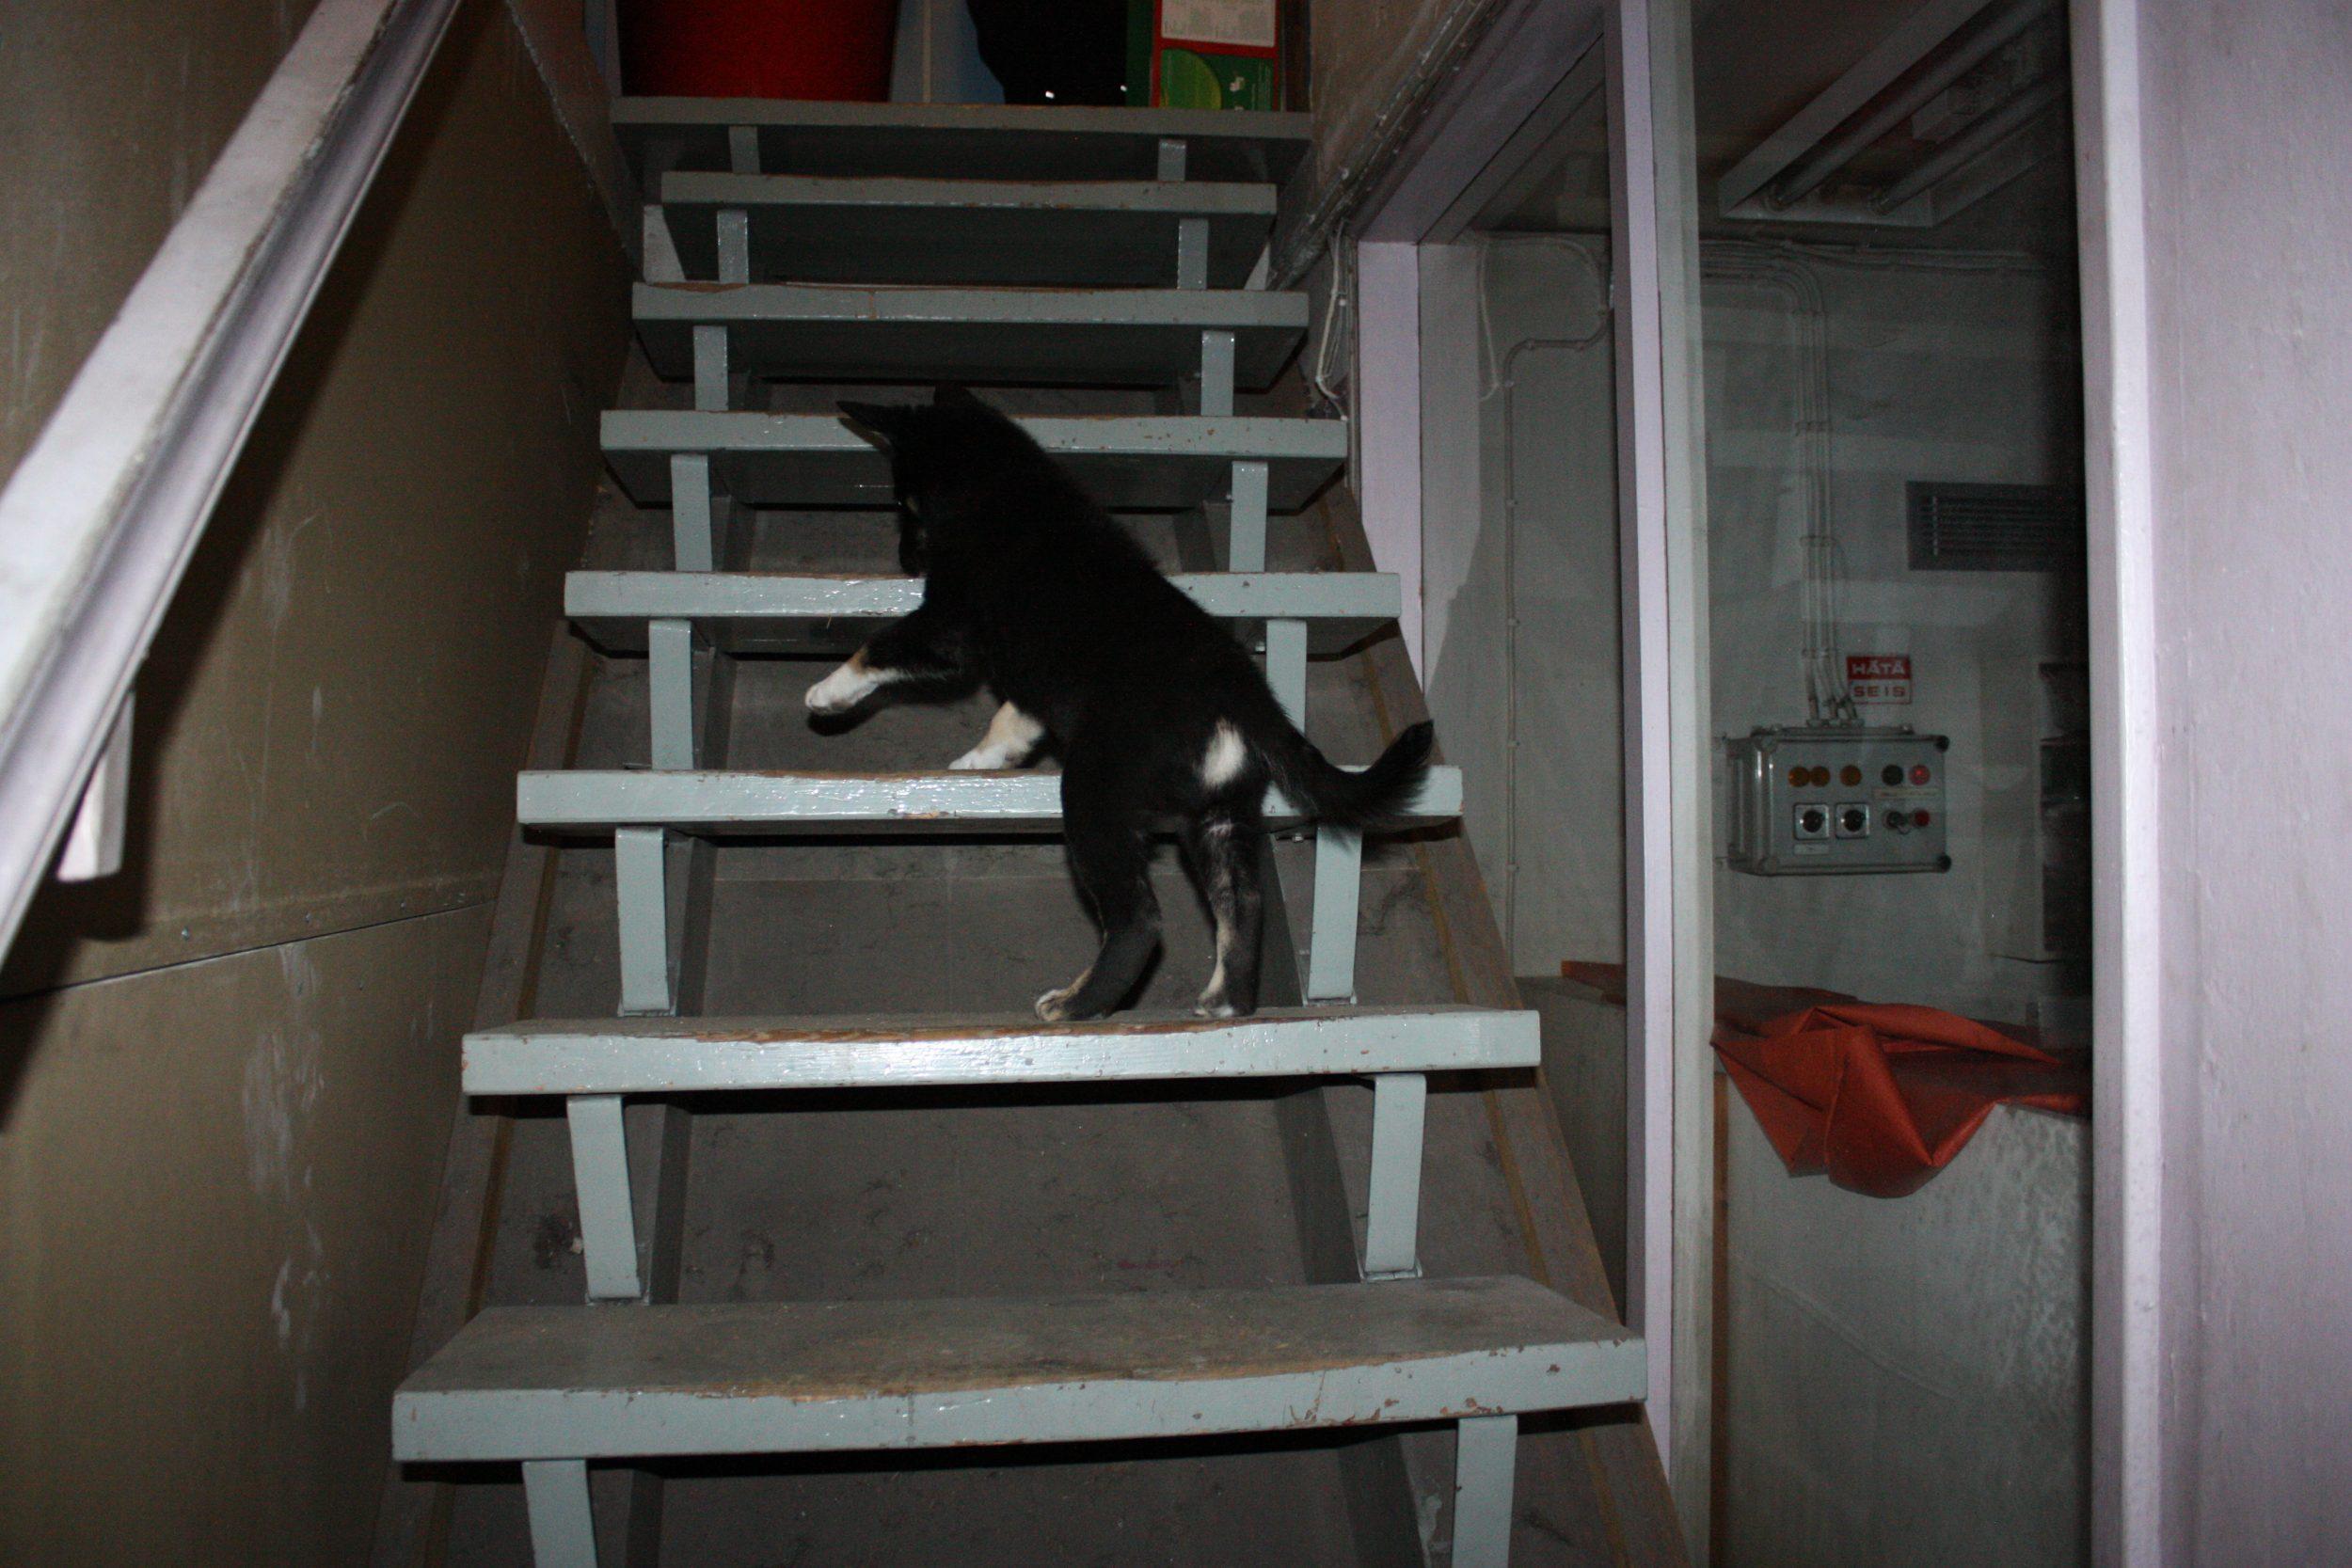 Pentukoulu etenee askel askeleelta